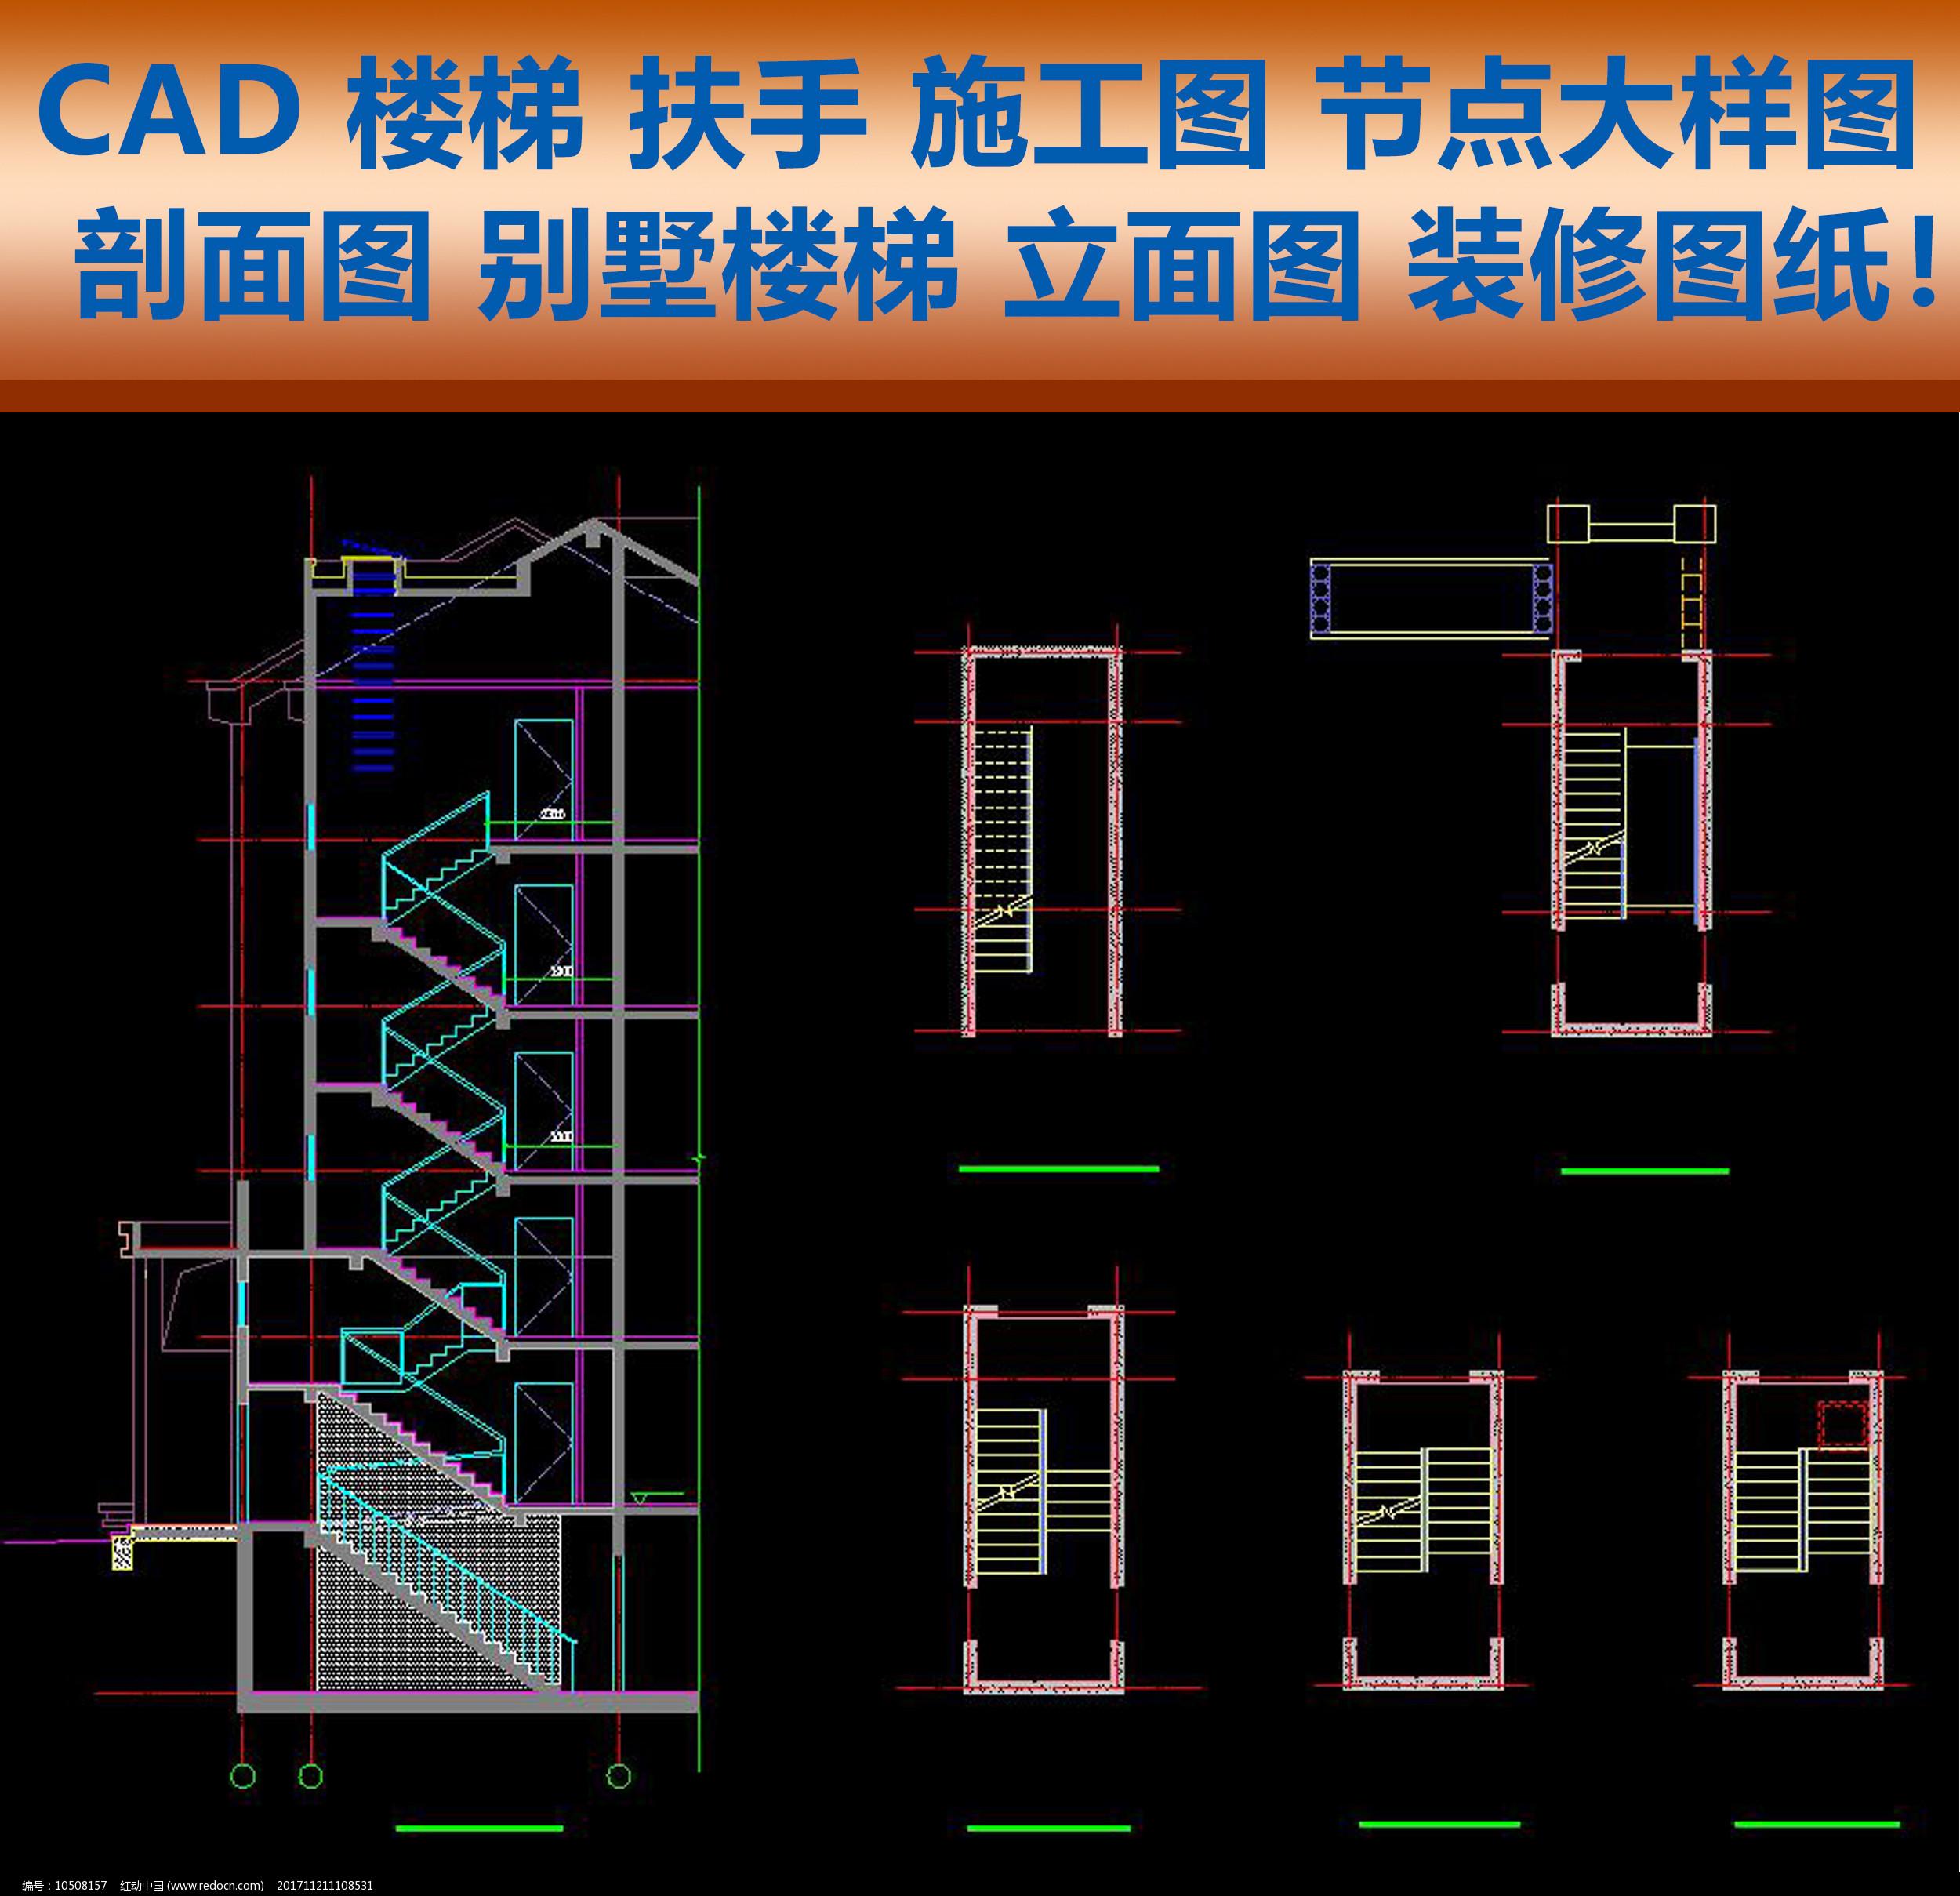 CAD楼梯扶手施工图节点大样图别墅图片